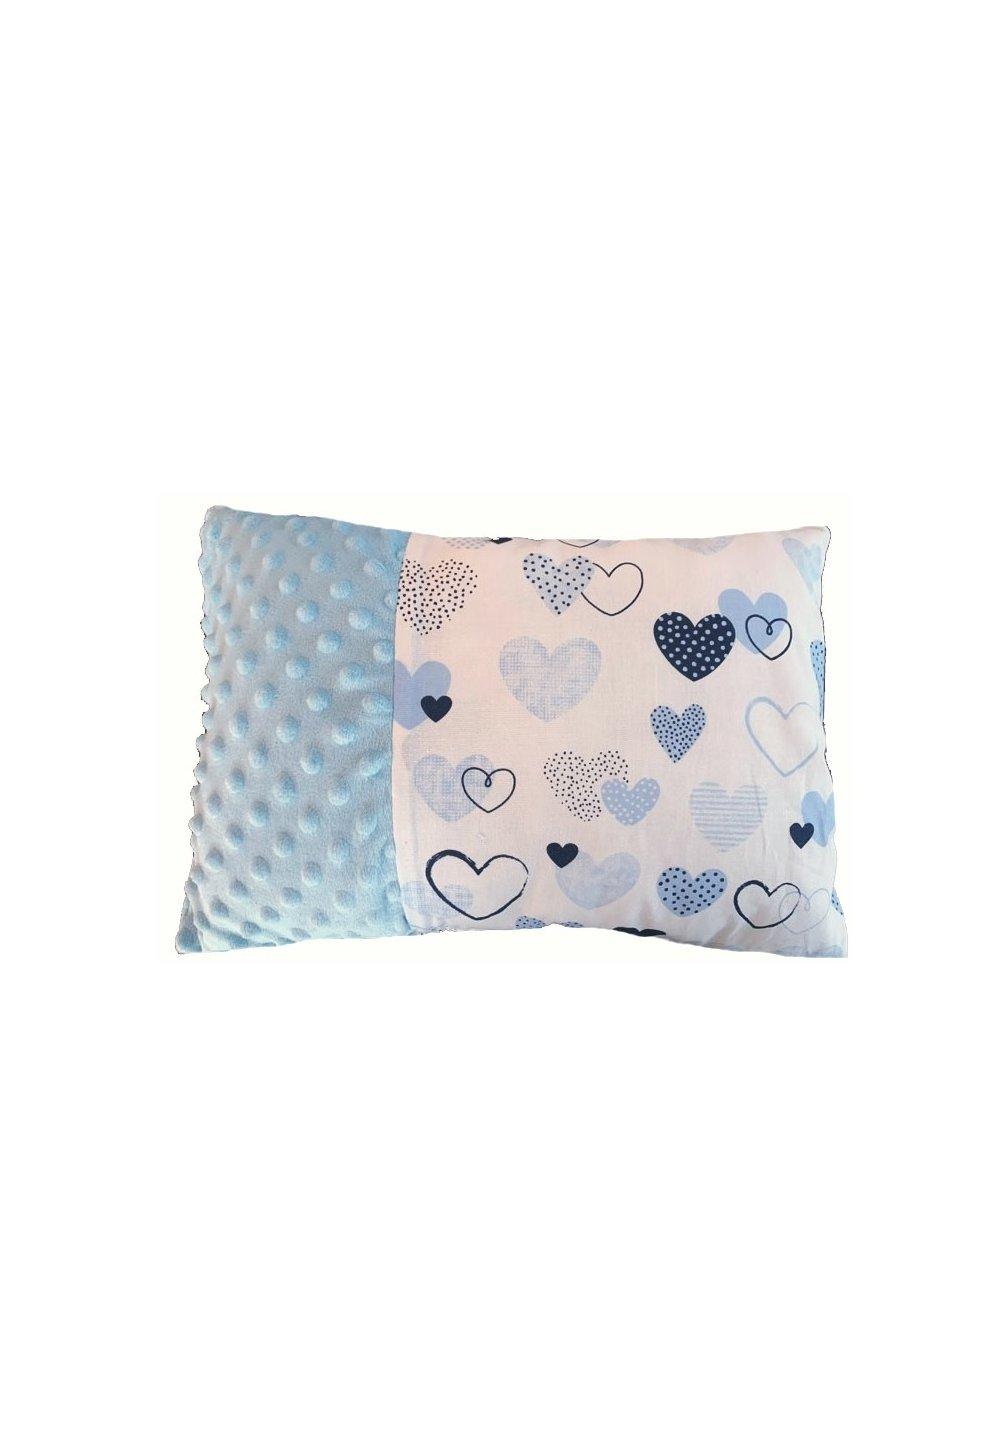 Perna, minky, alb cu inimioare albastre, 30x40cm imagine